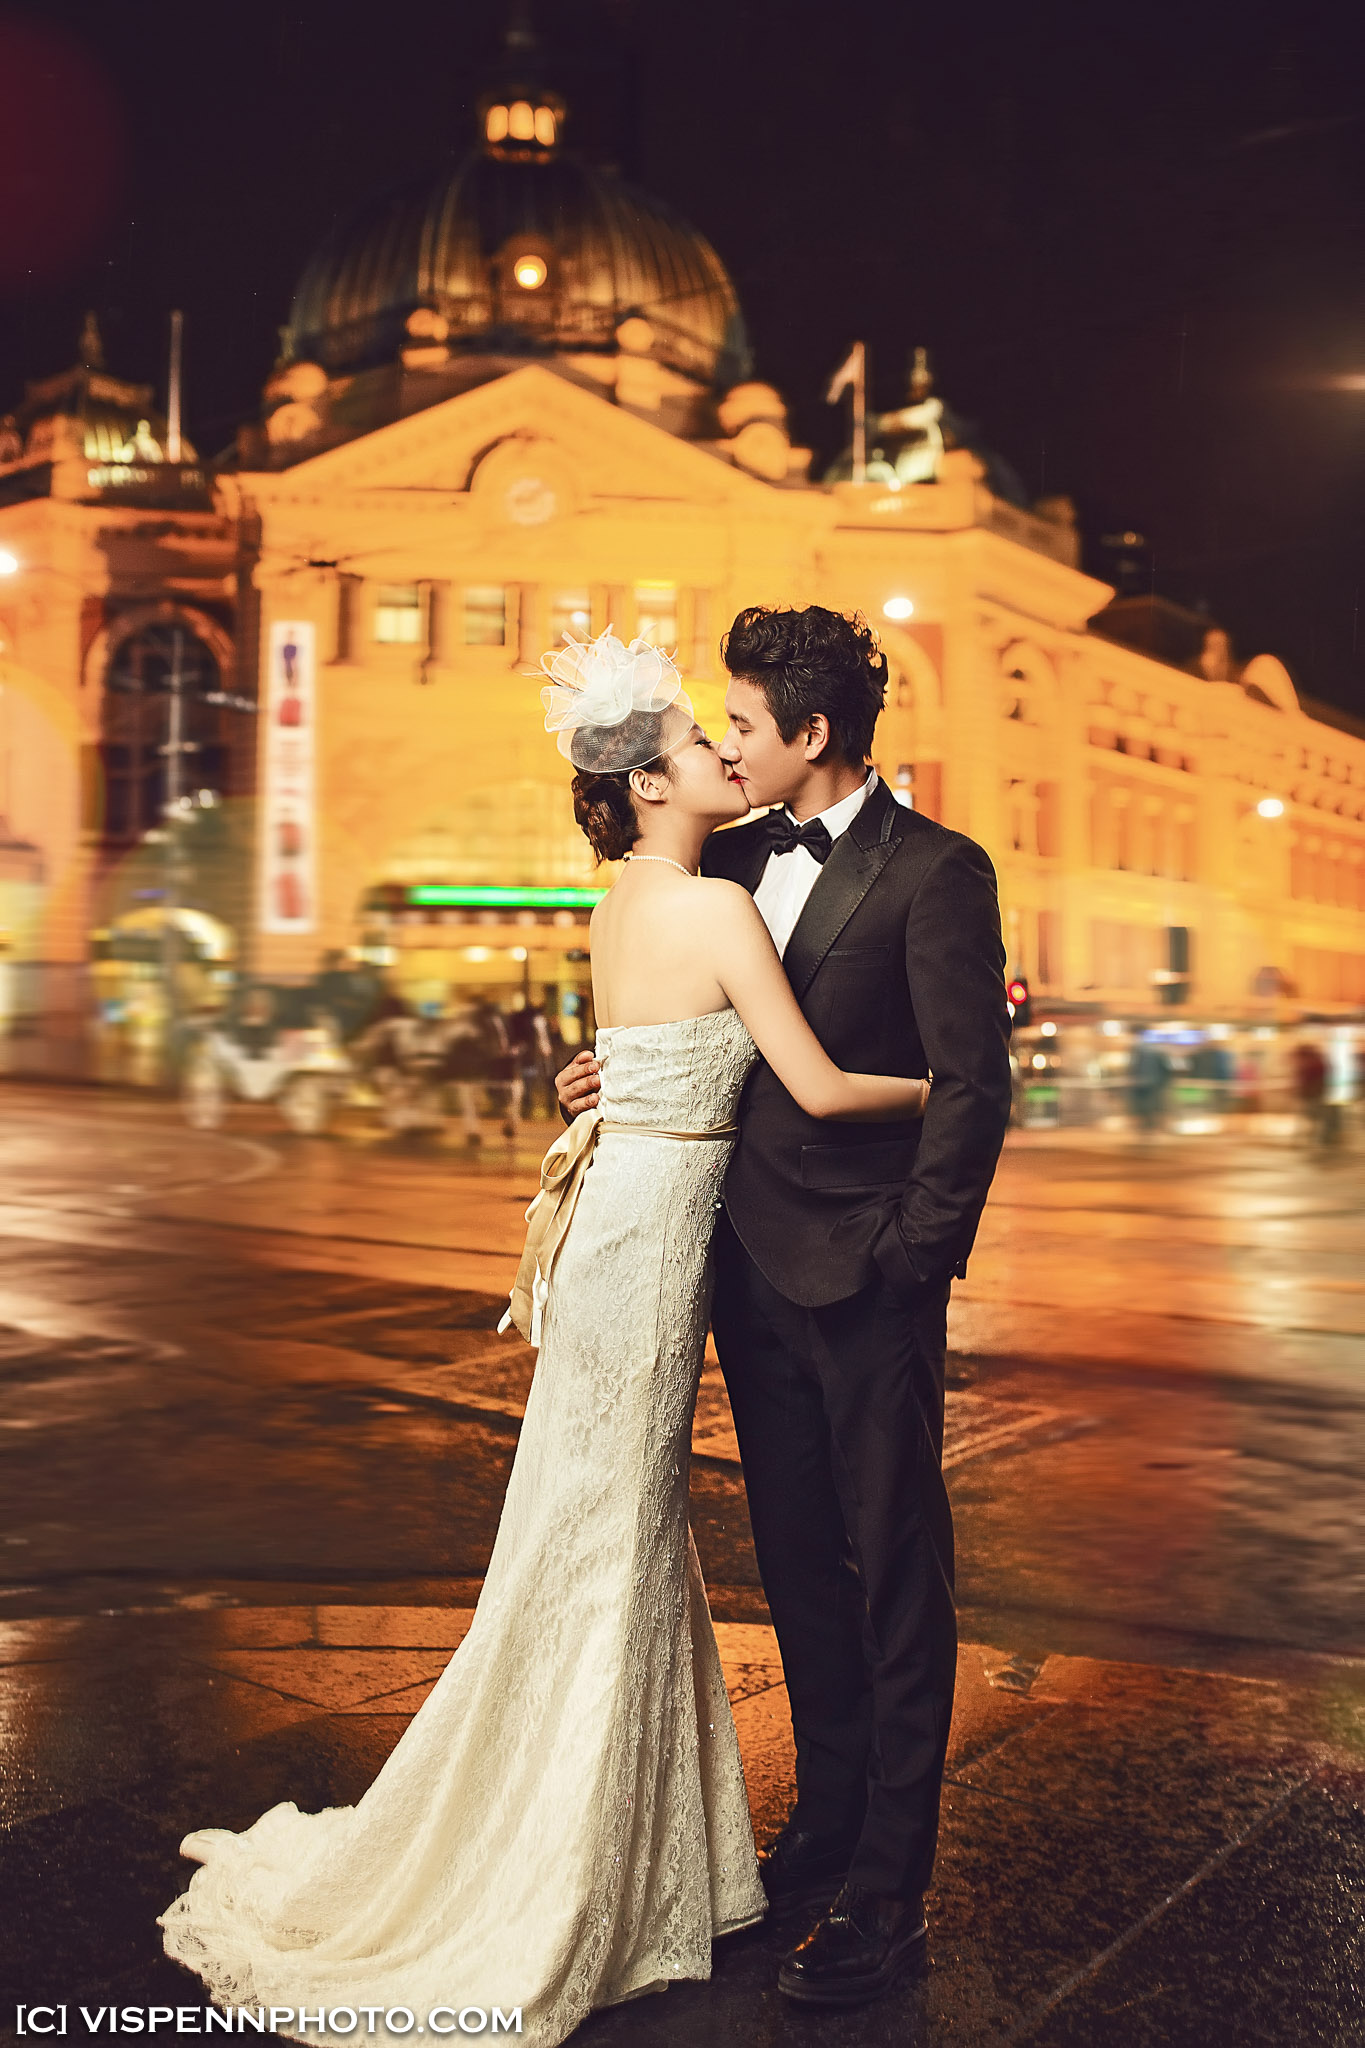 PRE WEDDING Photography Melbourne VISPENN 墨尔本 婚纱照 结婚照 婚纱摄影 5D3 4060